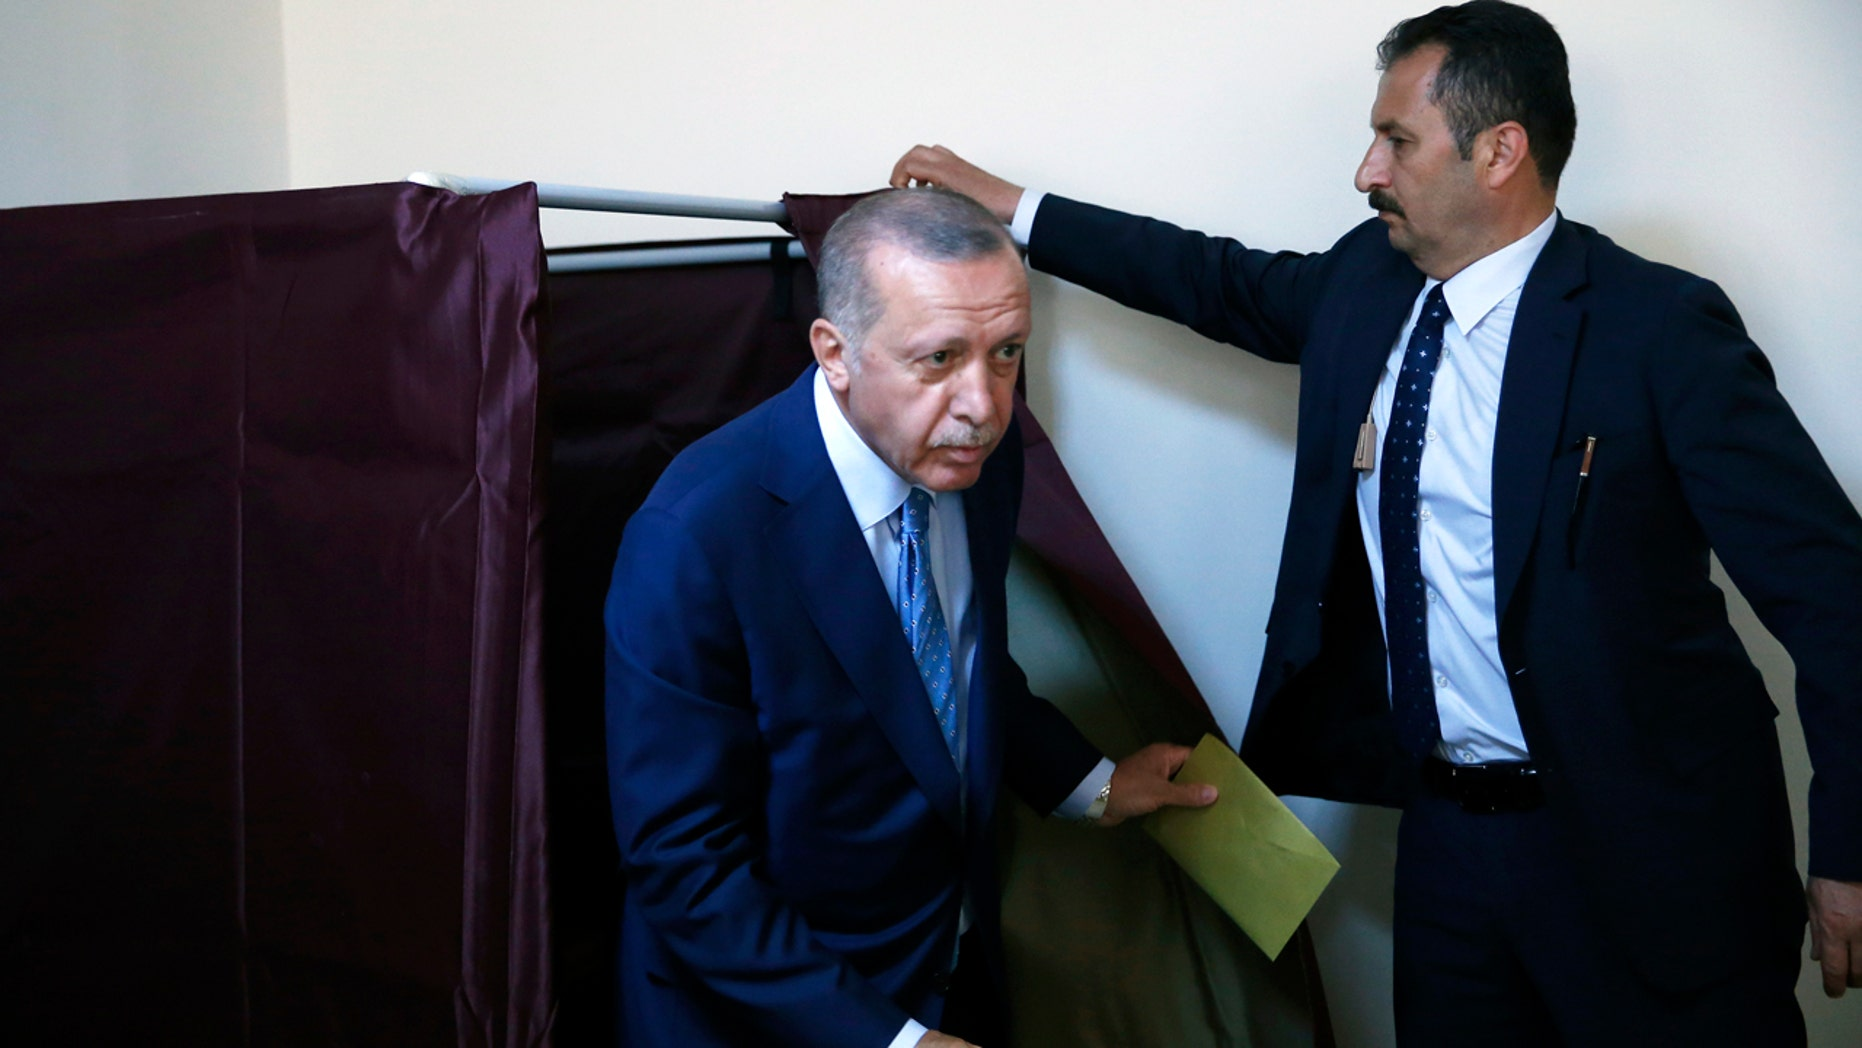 Turkey's President Recep Tayyip Erdogan cast his ballot in Istanbul Sunday.